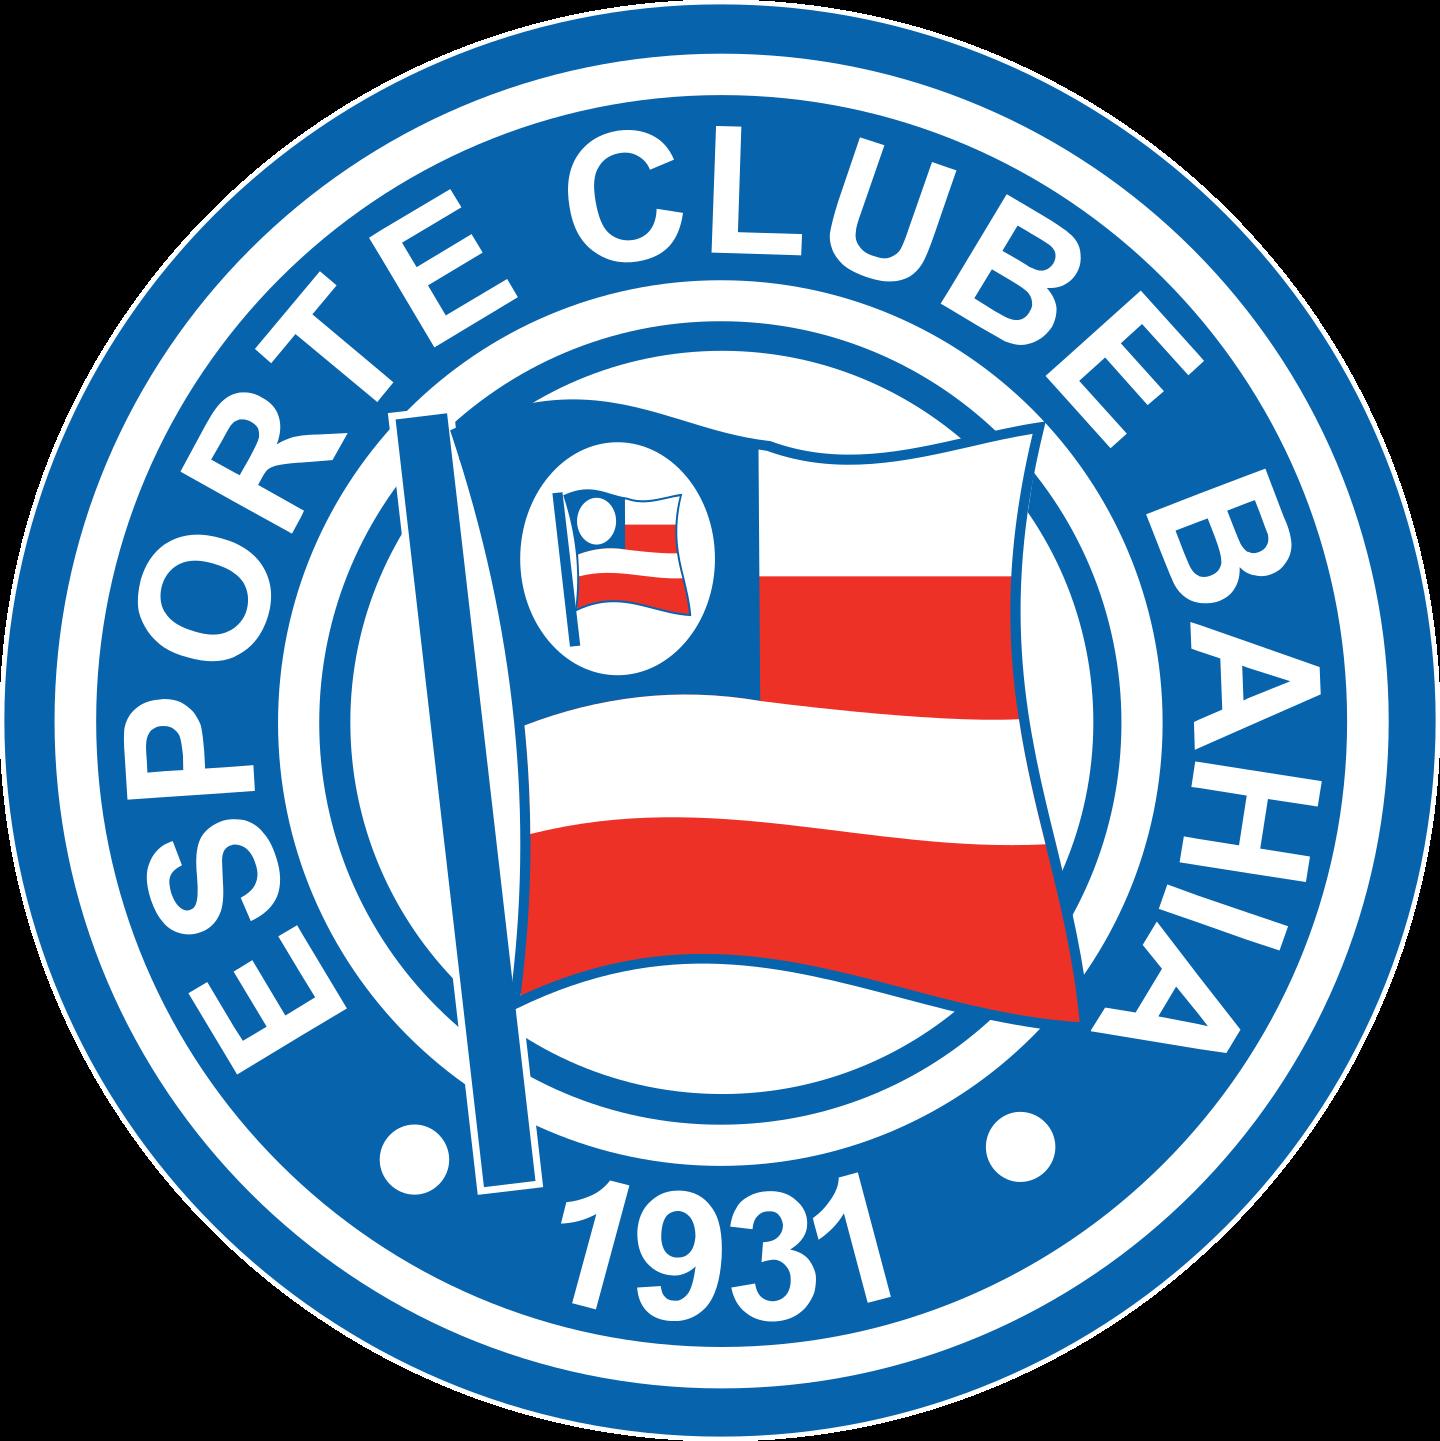 bahia ec logo 02 - E C Bahia Logo